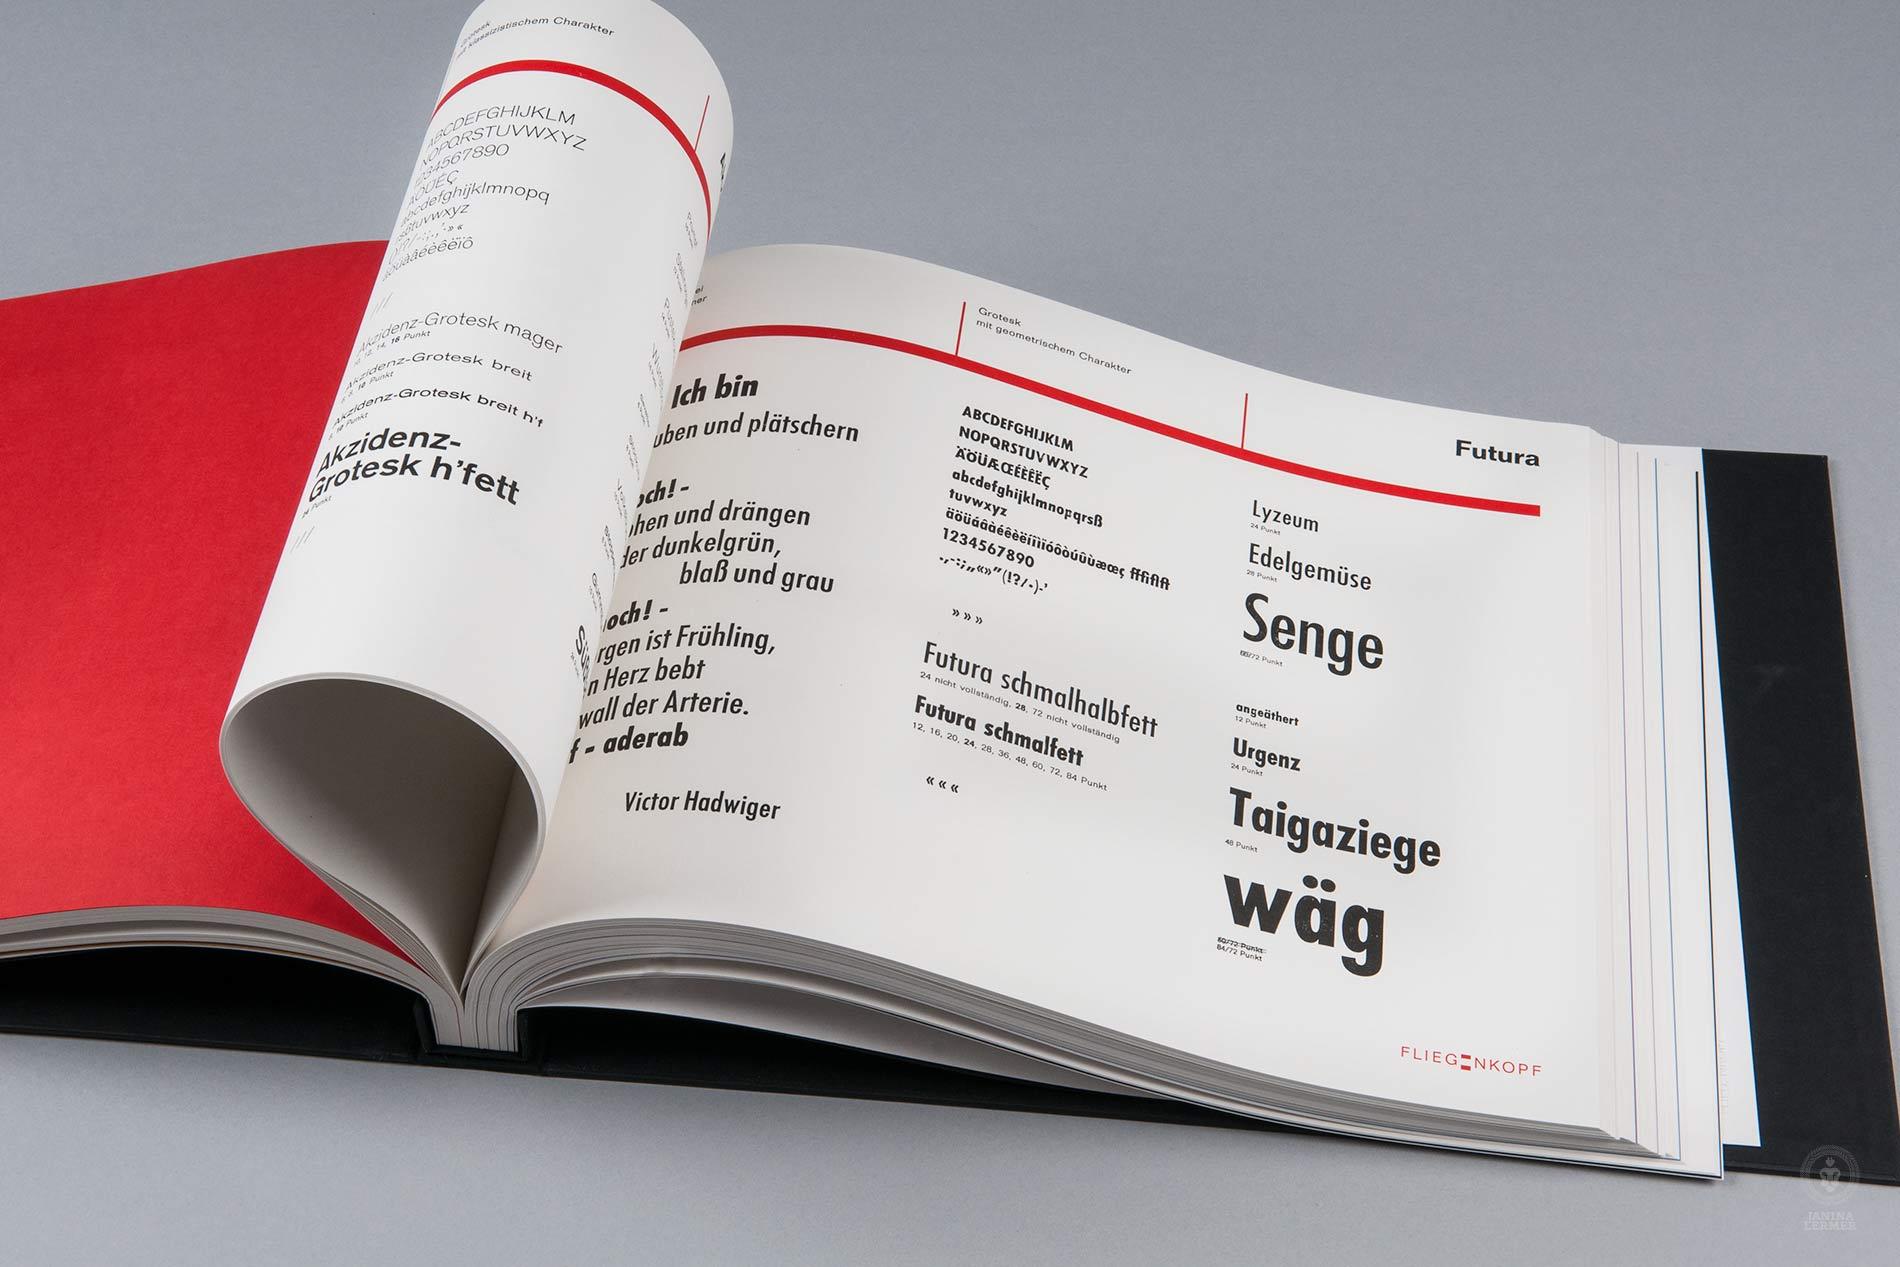 Janina-Lermer-Buchgestaltung-Magazingestaltung-Editorialdesign-Bleisatz-Metalype-Geometrische-Grotesk-Handgedruckt-Handprinted-Werkstatt-Fliegenkopf